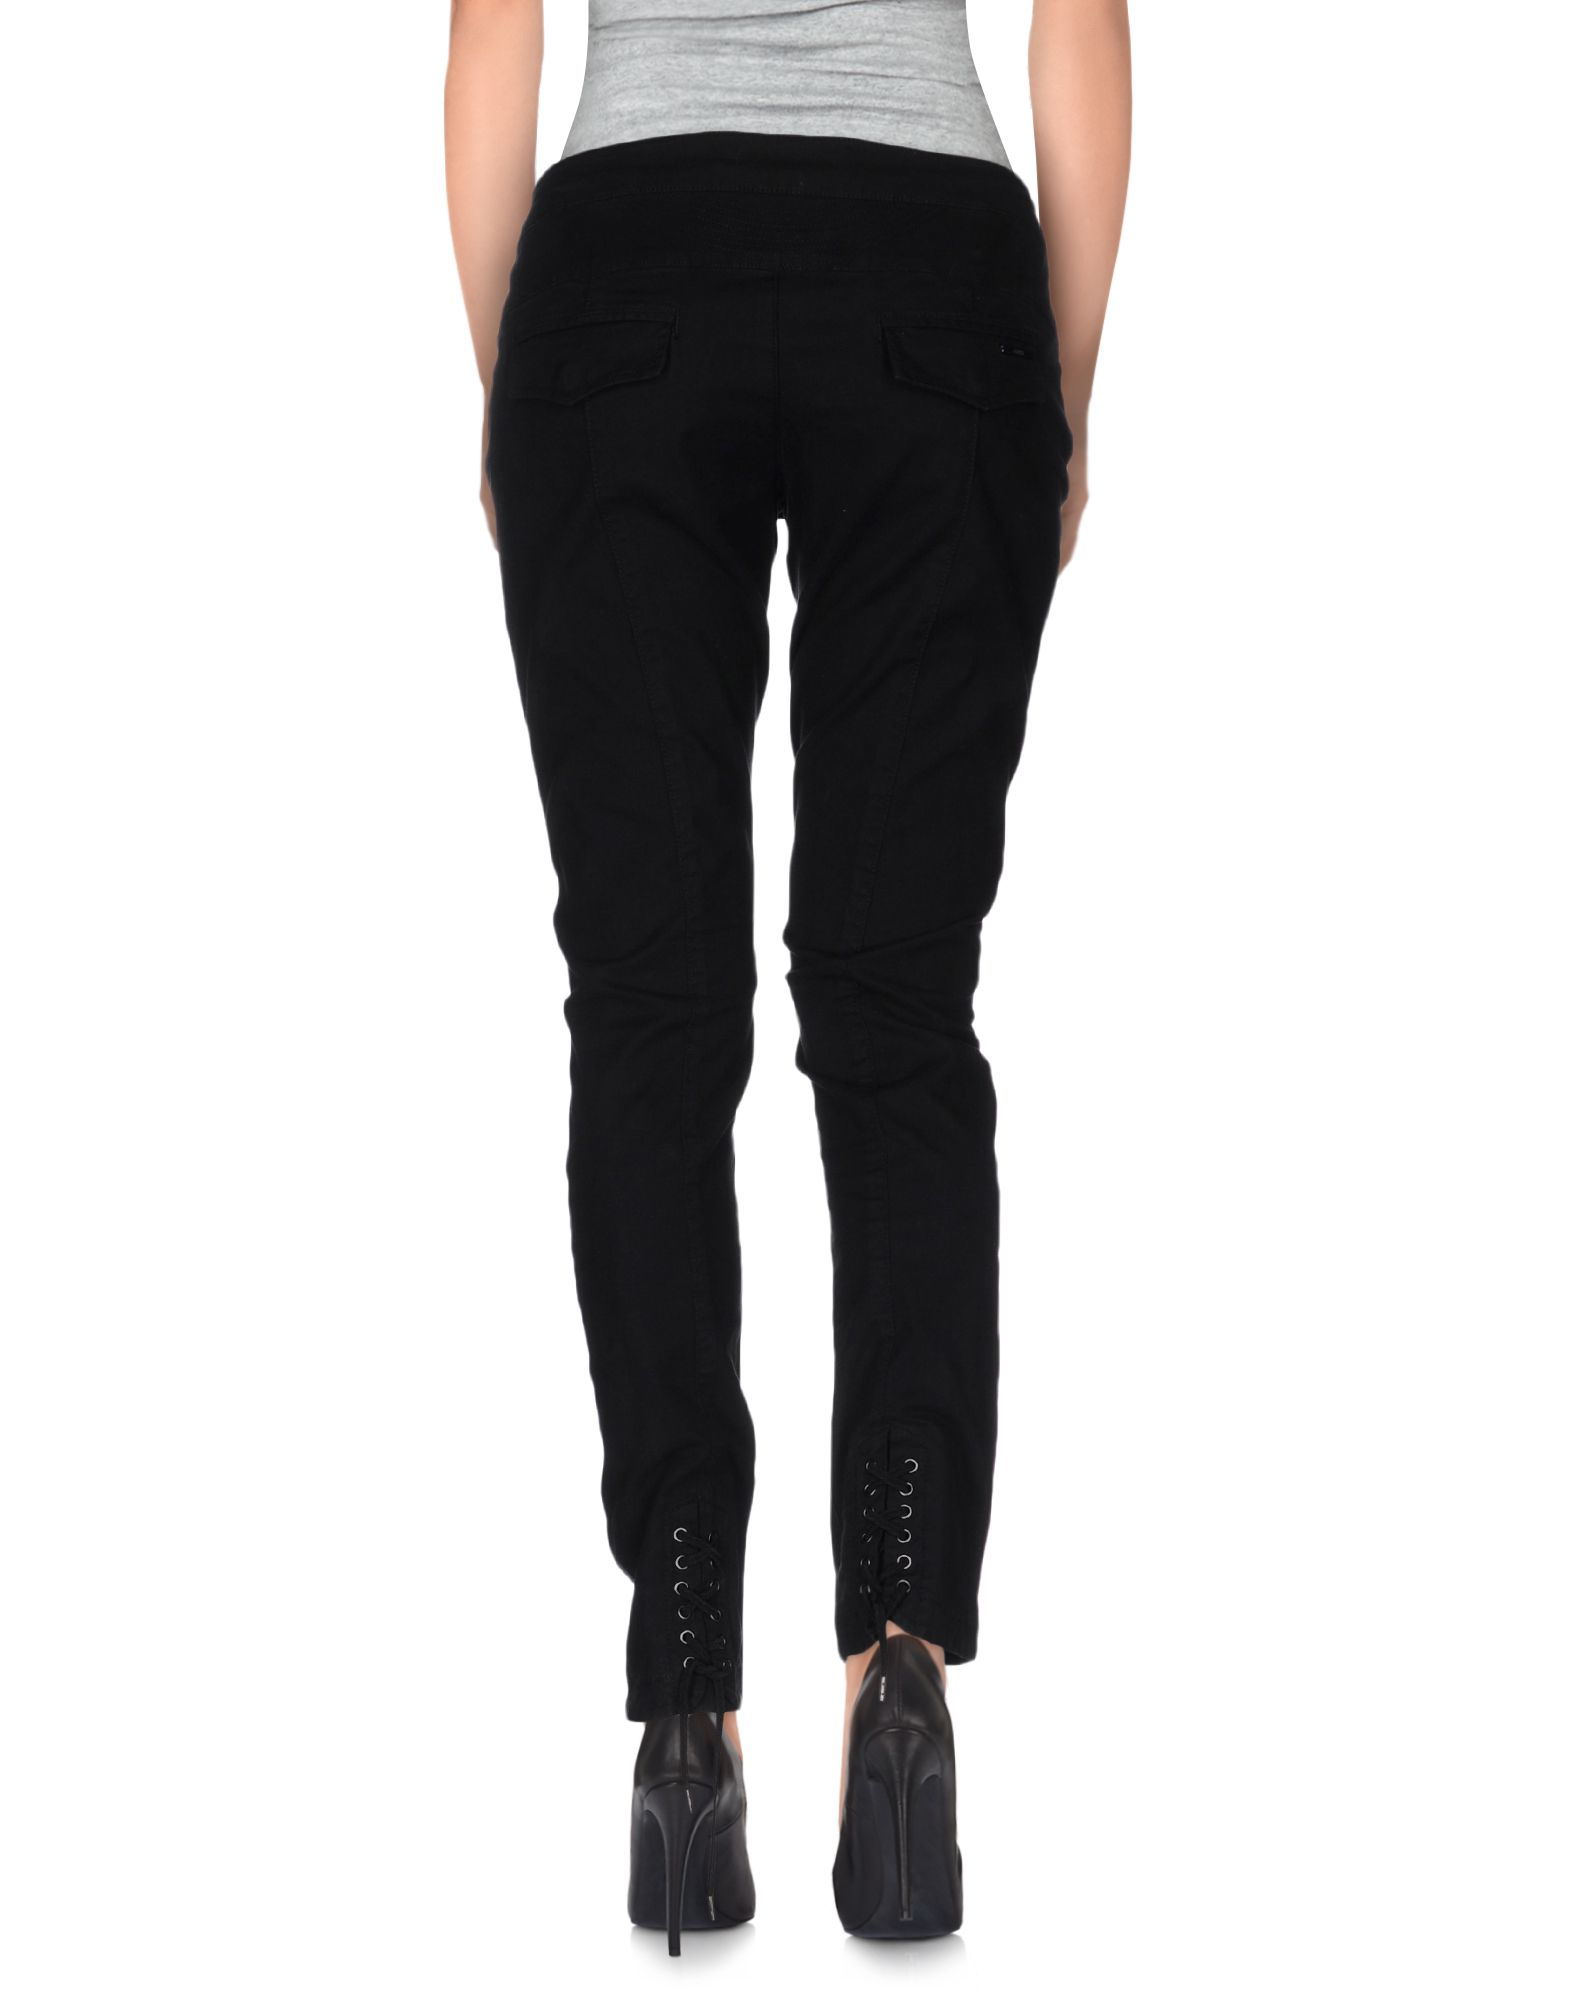 Fantastic   WOMEN  Womens Clothing  Trousers  GUESS BY MARCIANO CAPRI PANTS